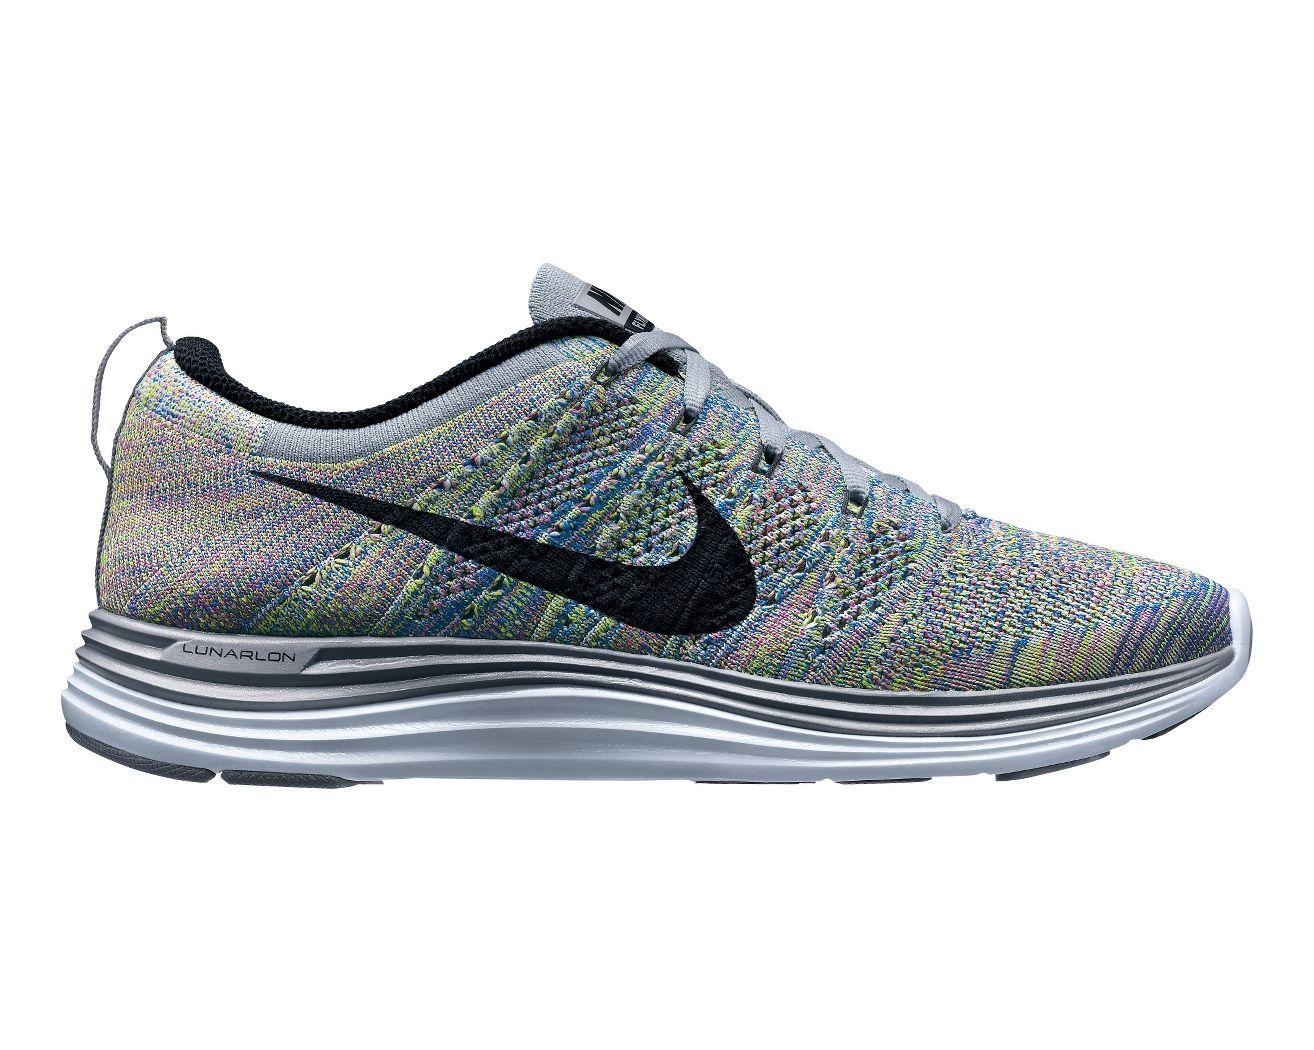 wholesale dealer c05b0 a1f5e Womens Nike Flyknit Lunar1+ Running Shoe at Road Runner Sports